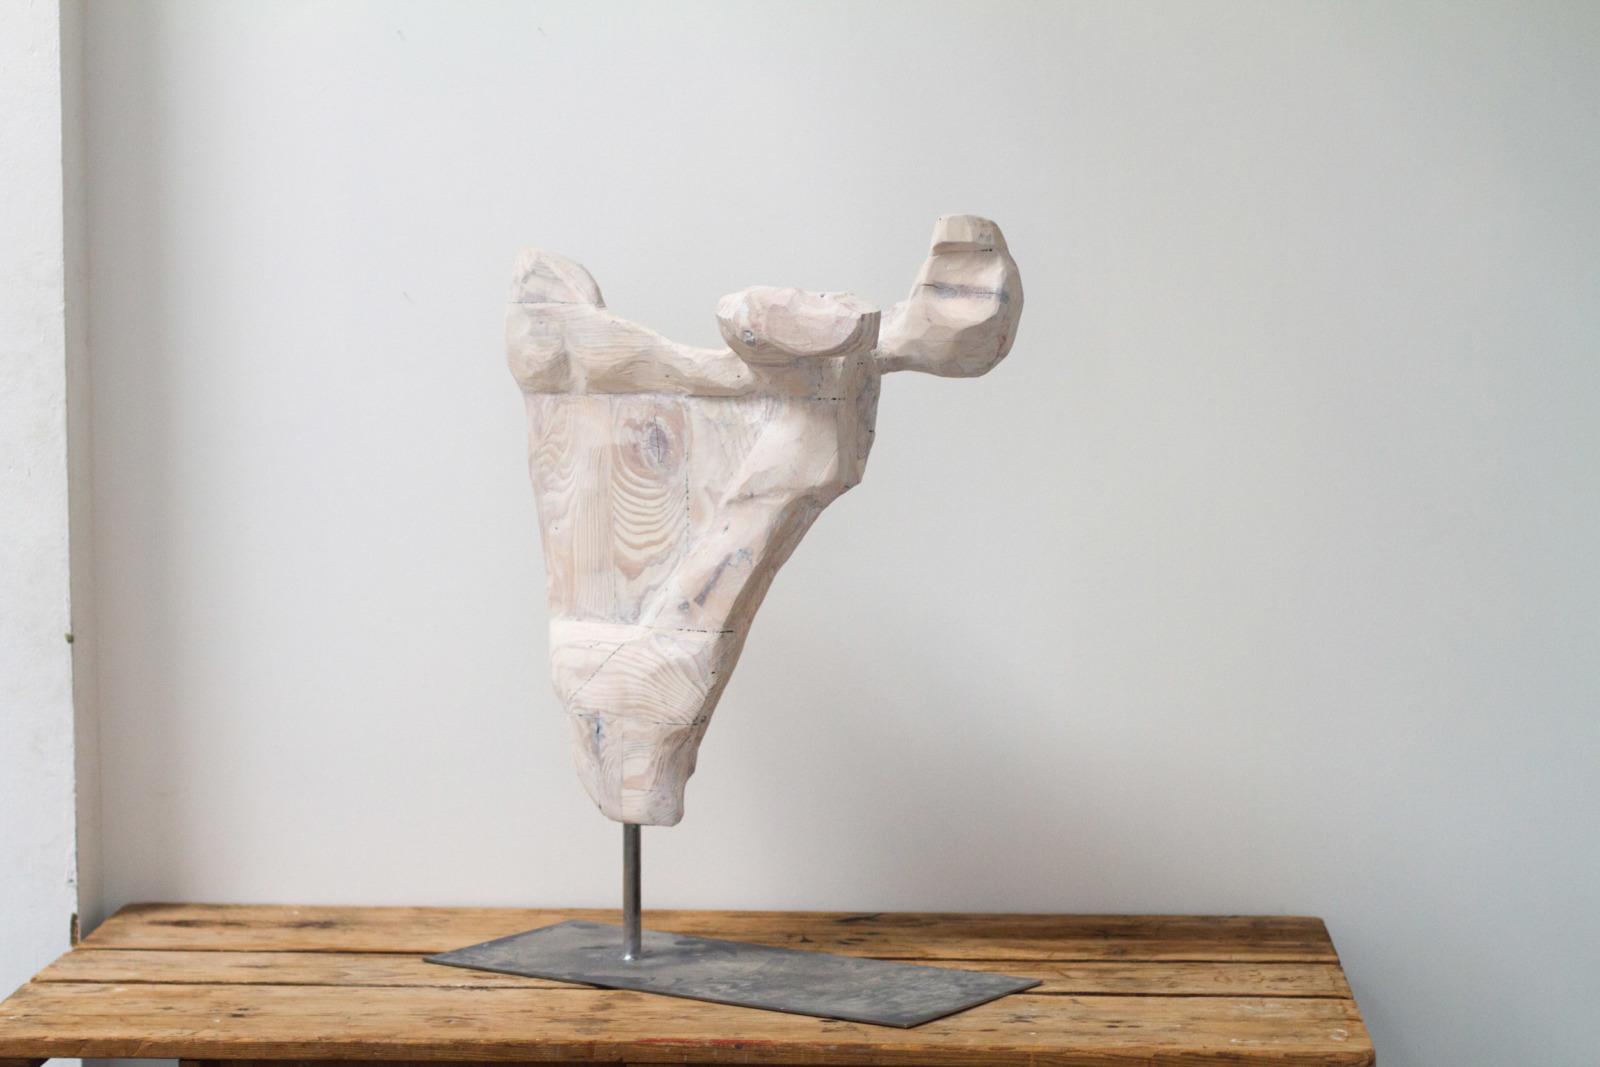 Artwork: Pallet Bones by Kasia Ozga